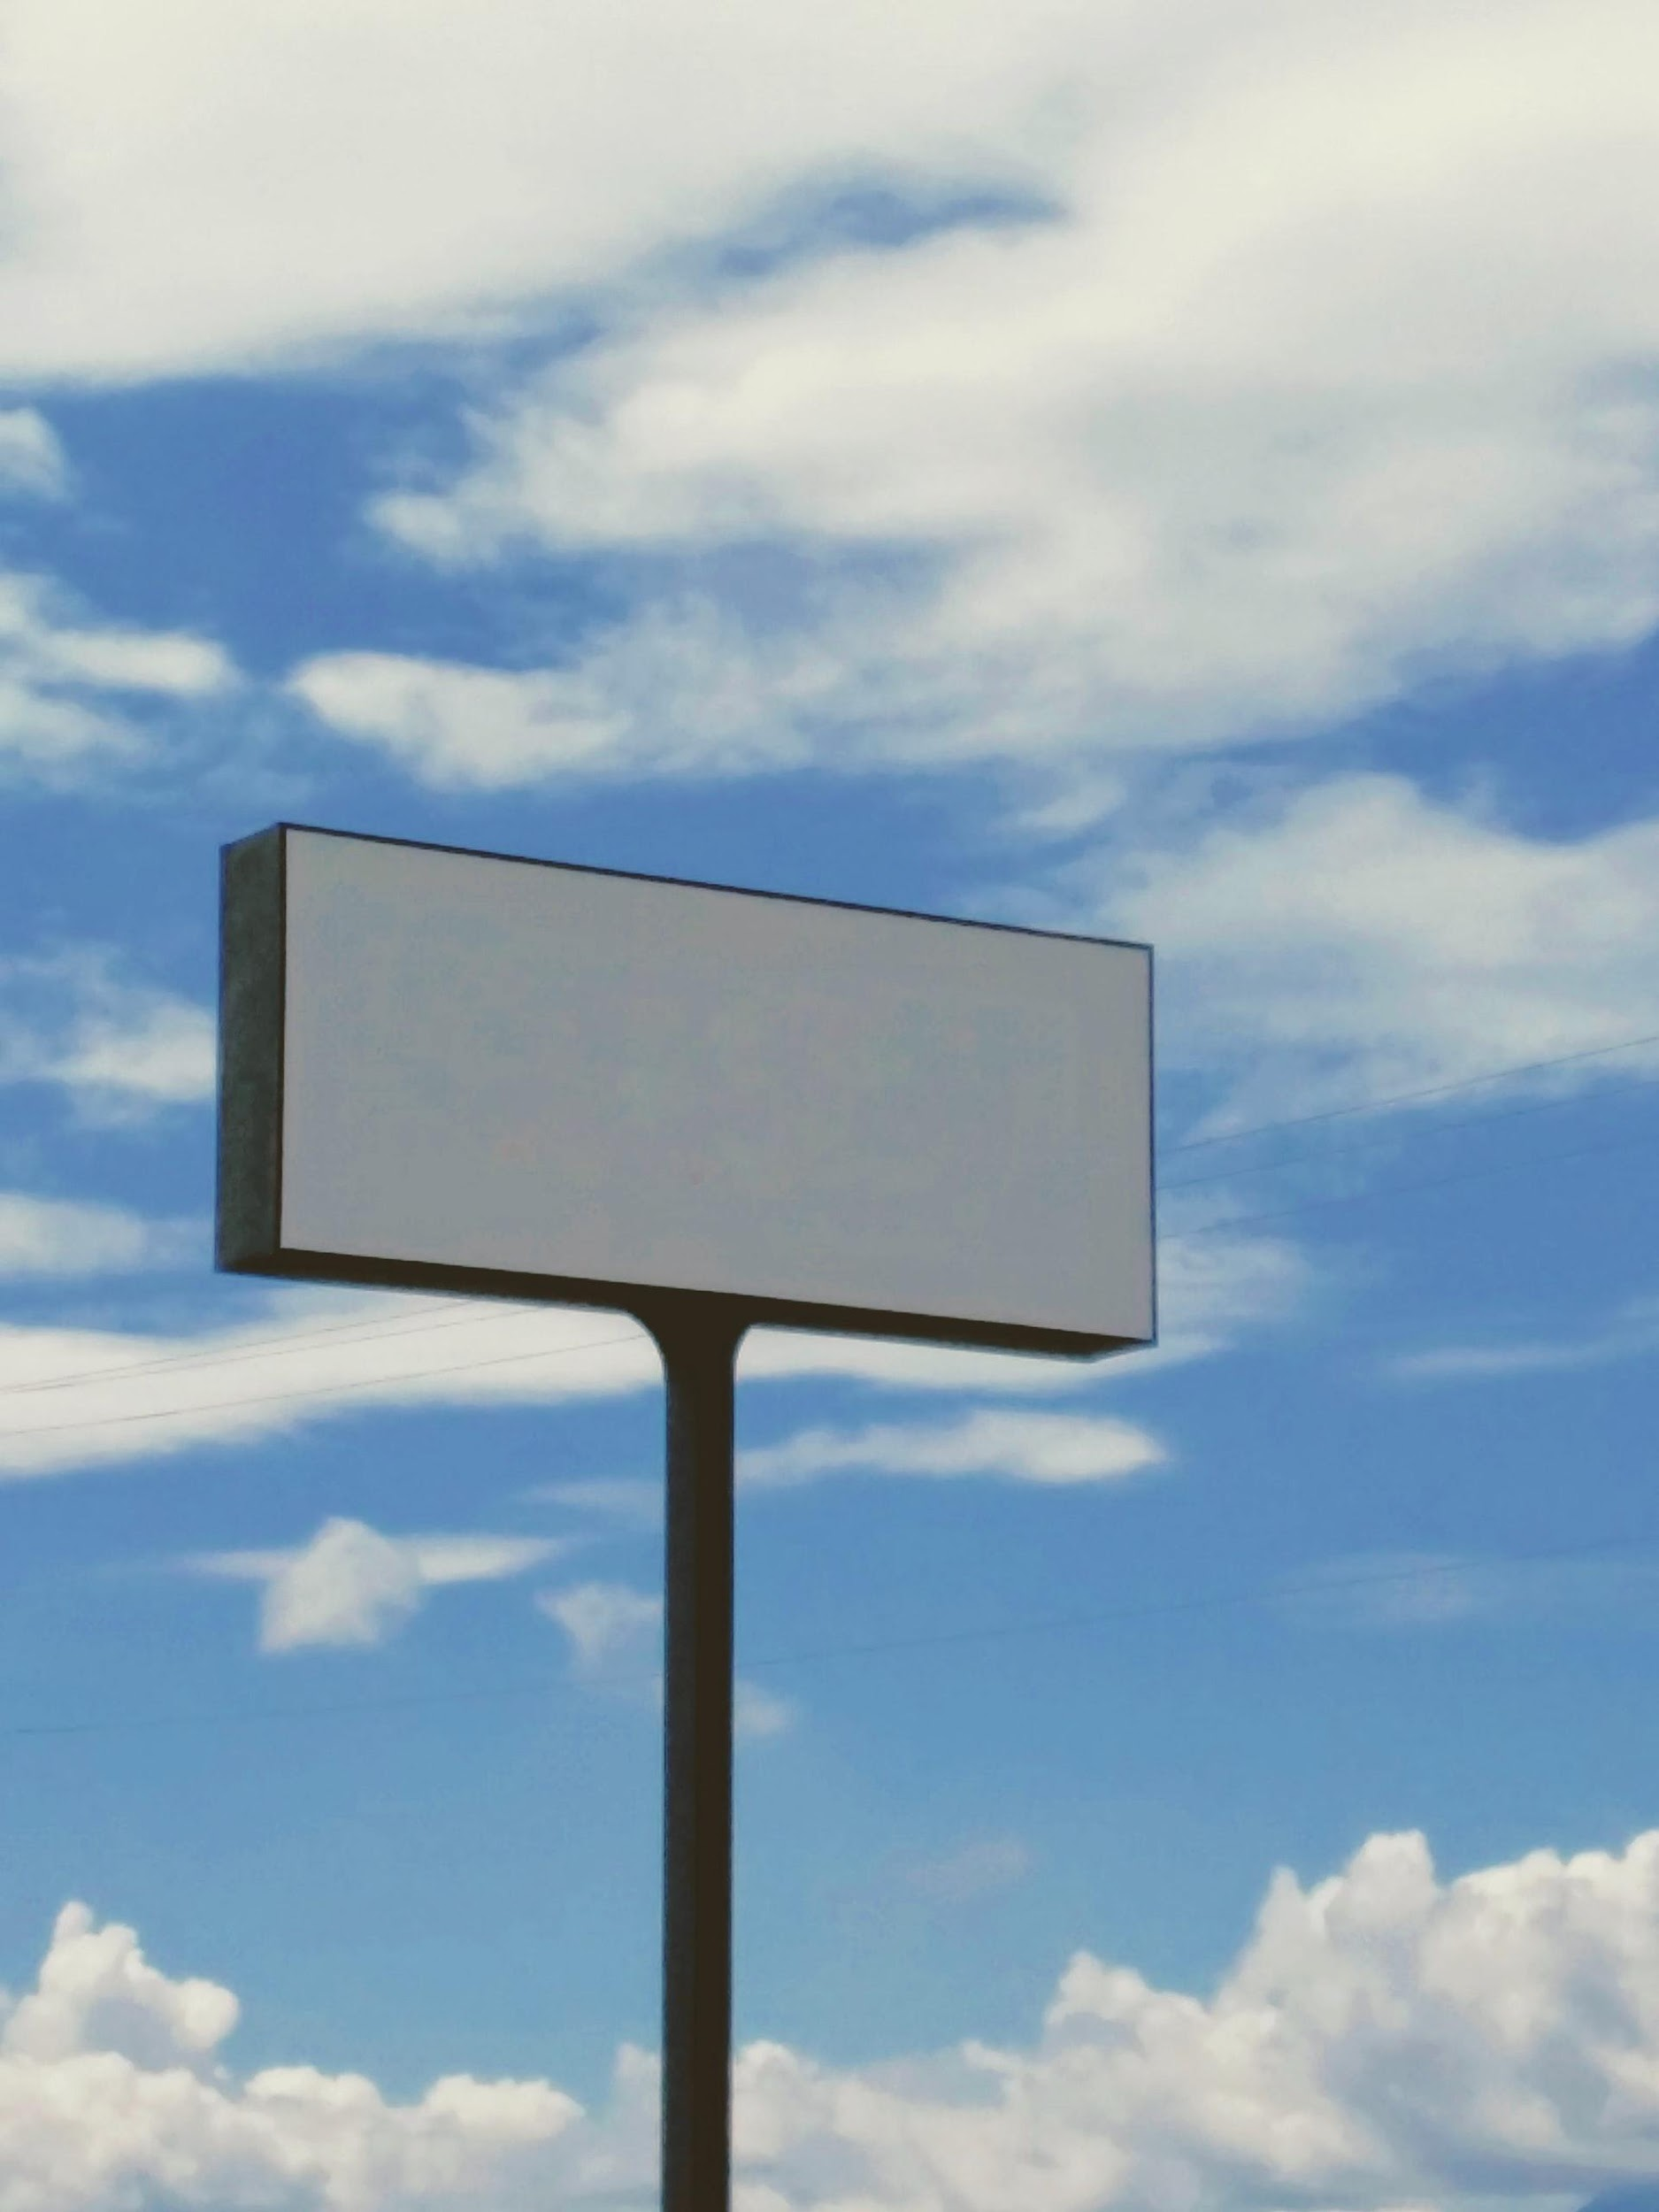 C:\Users\Nandini\Desktop\billboard.jpg